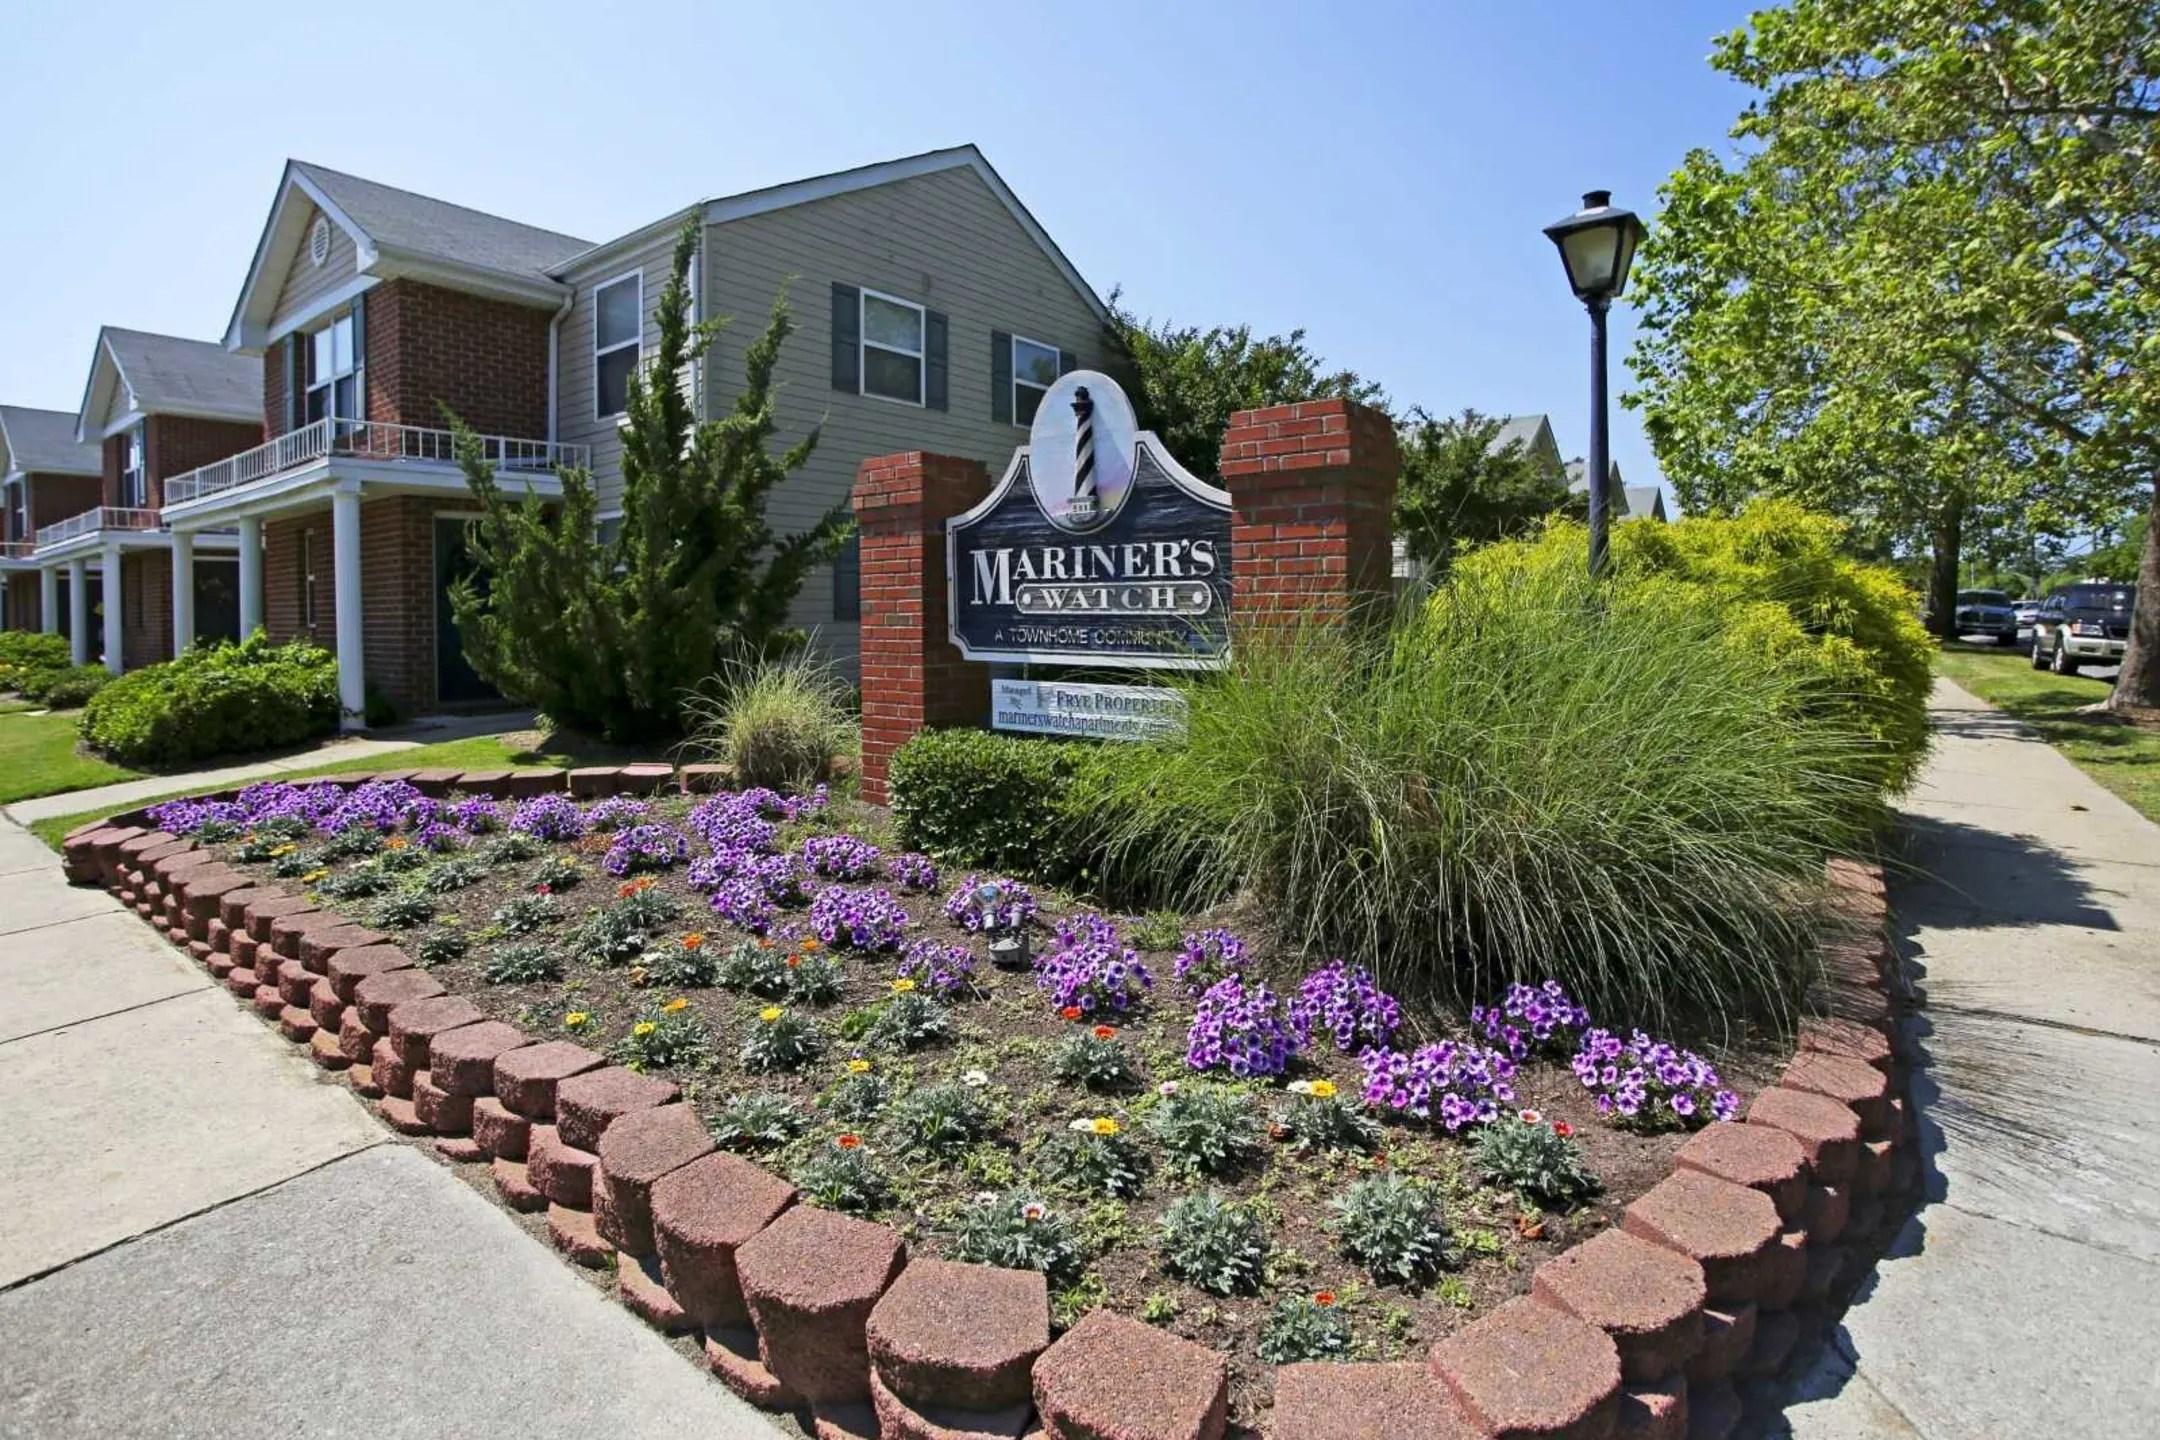 Mariners Watch Apartments  Norfolk VA 23503